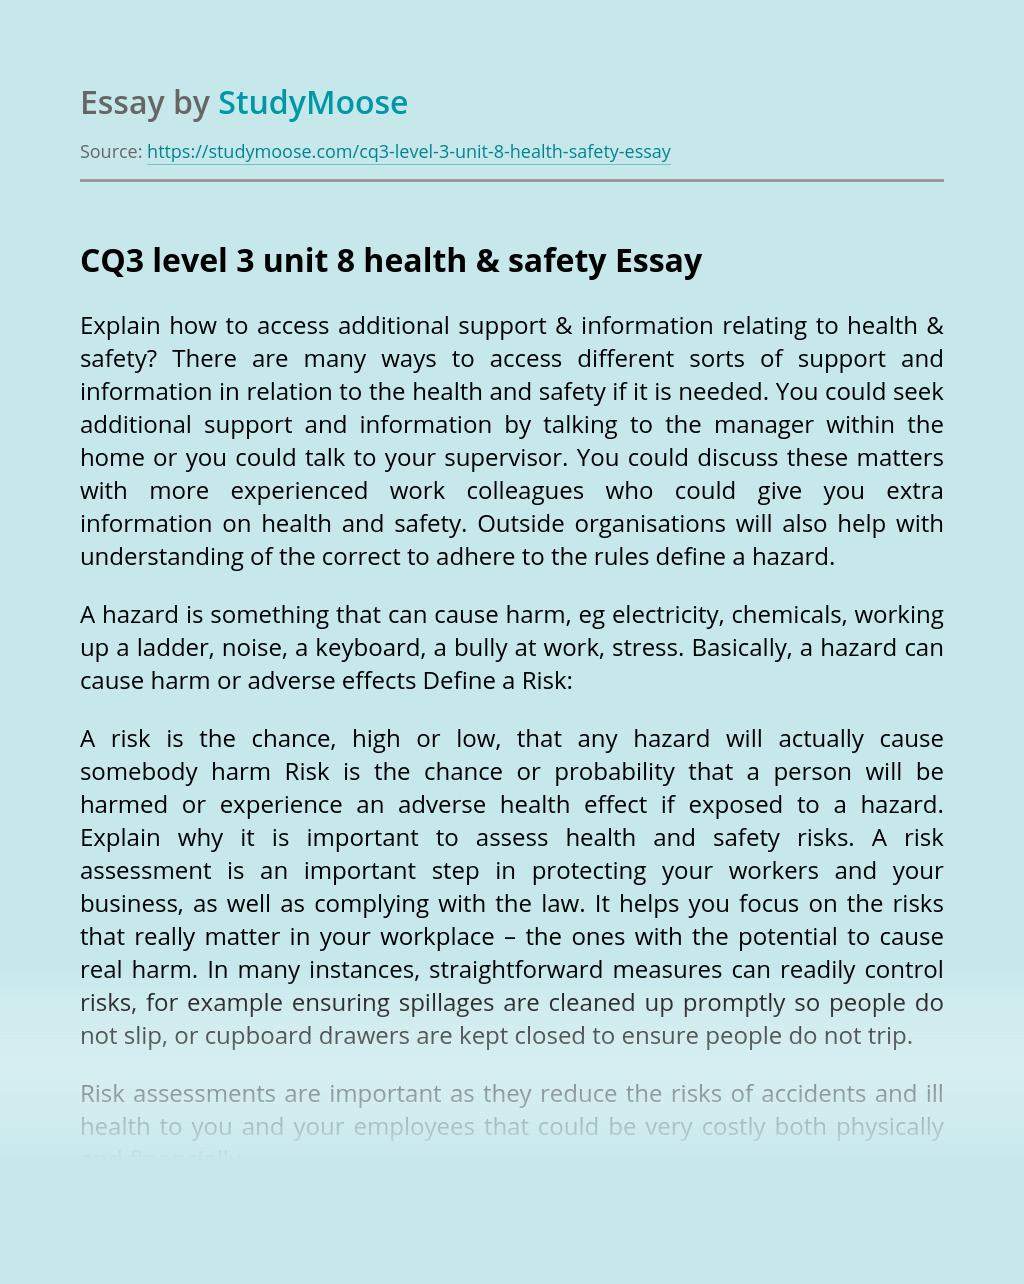 CQ3 level 3 unit 8 health & safety